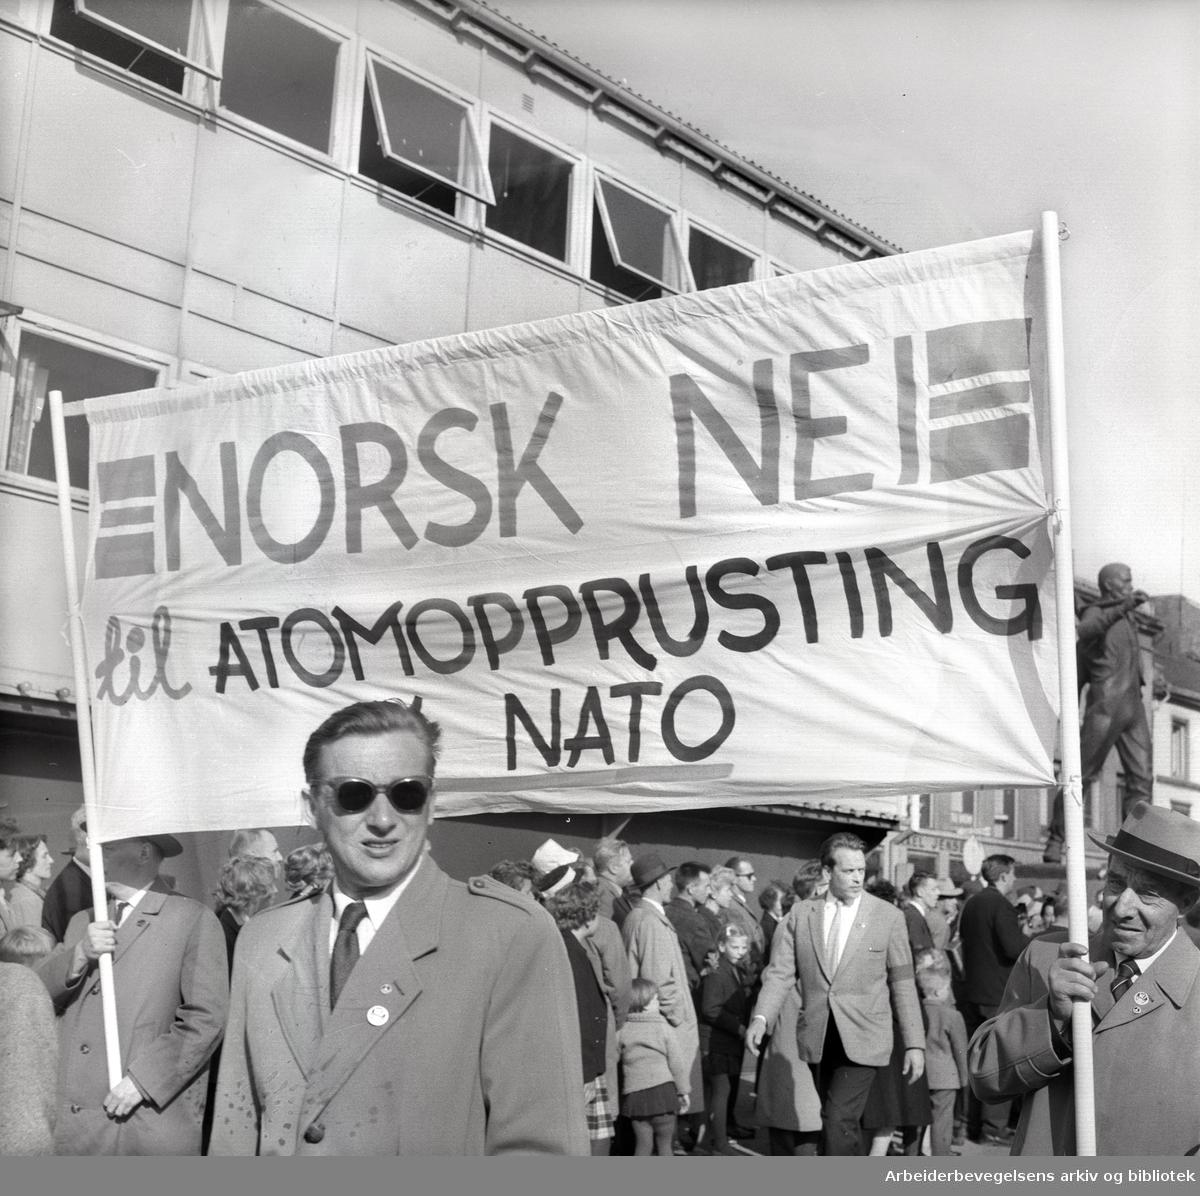 1. mai 1961, kommunistpartiets demonstrasjonstog på Youngstorget.Parole: Norsk nei til atomopprustning i NATO.